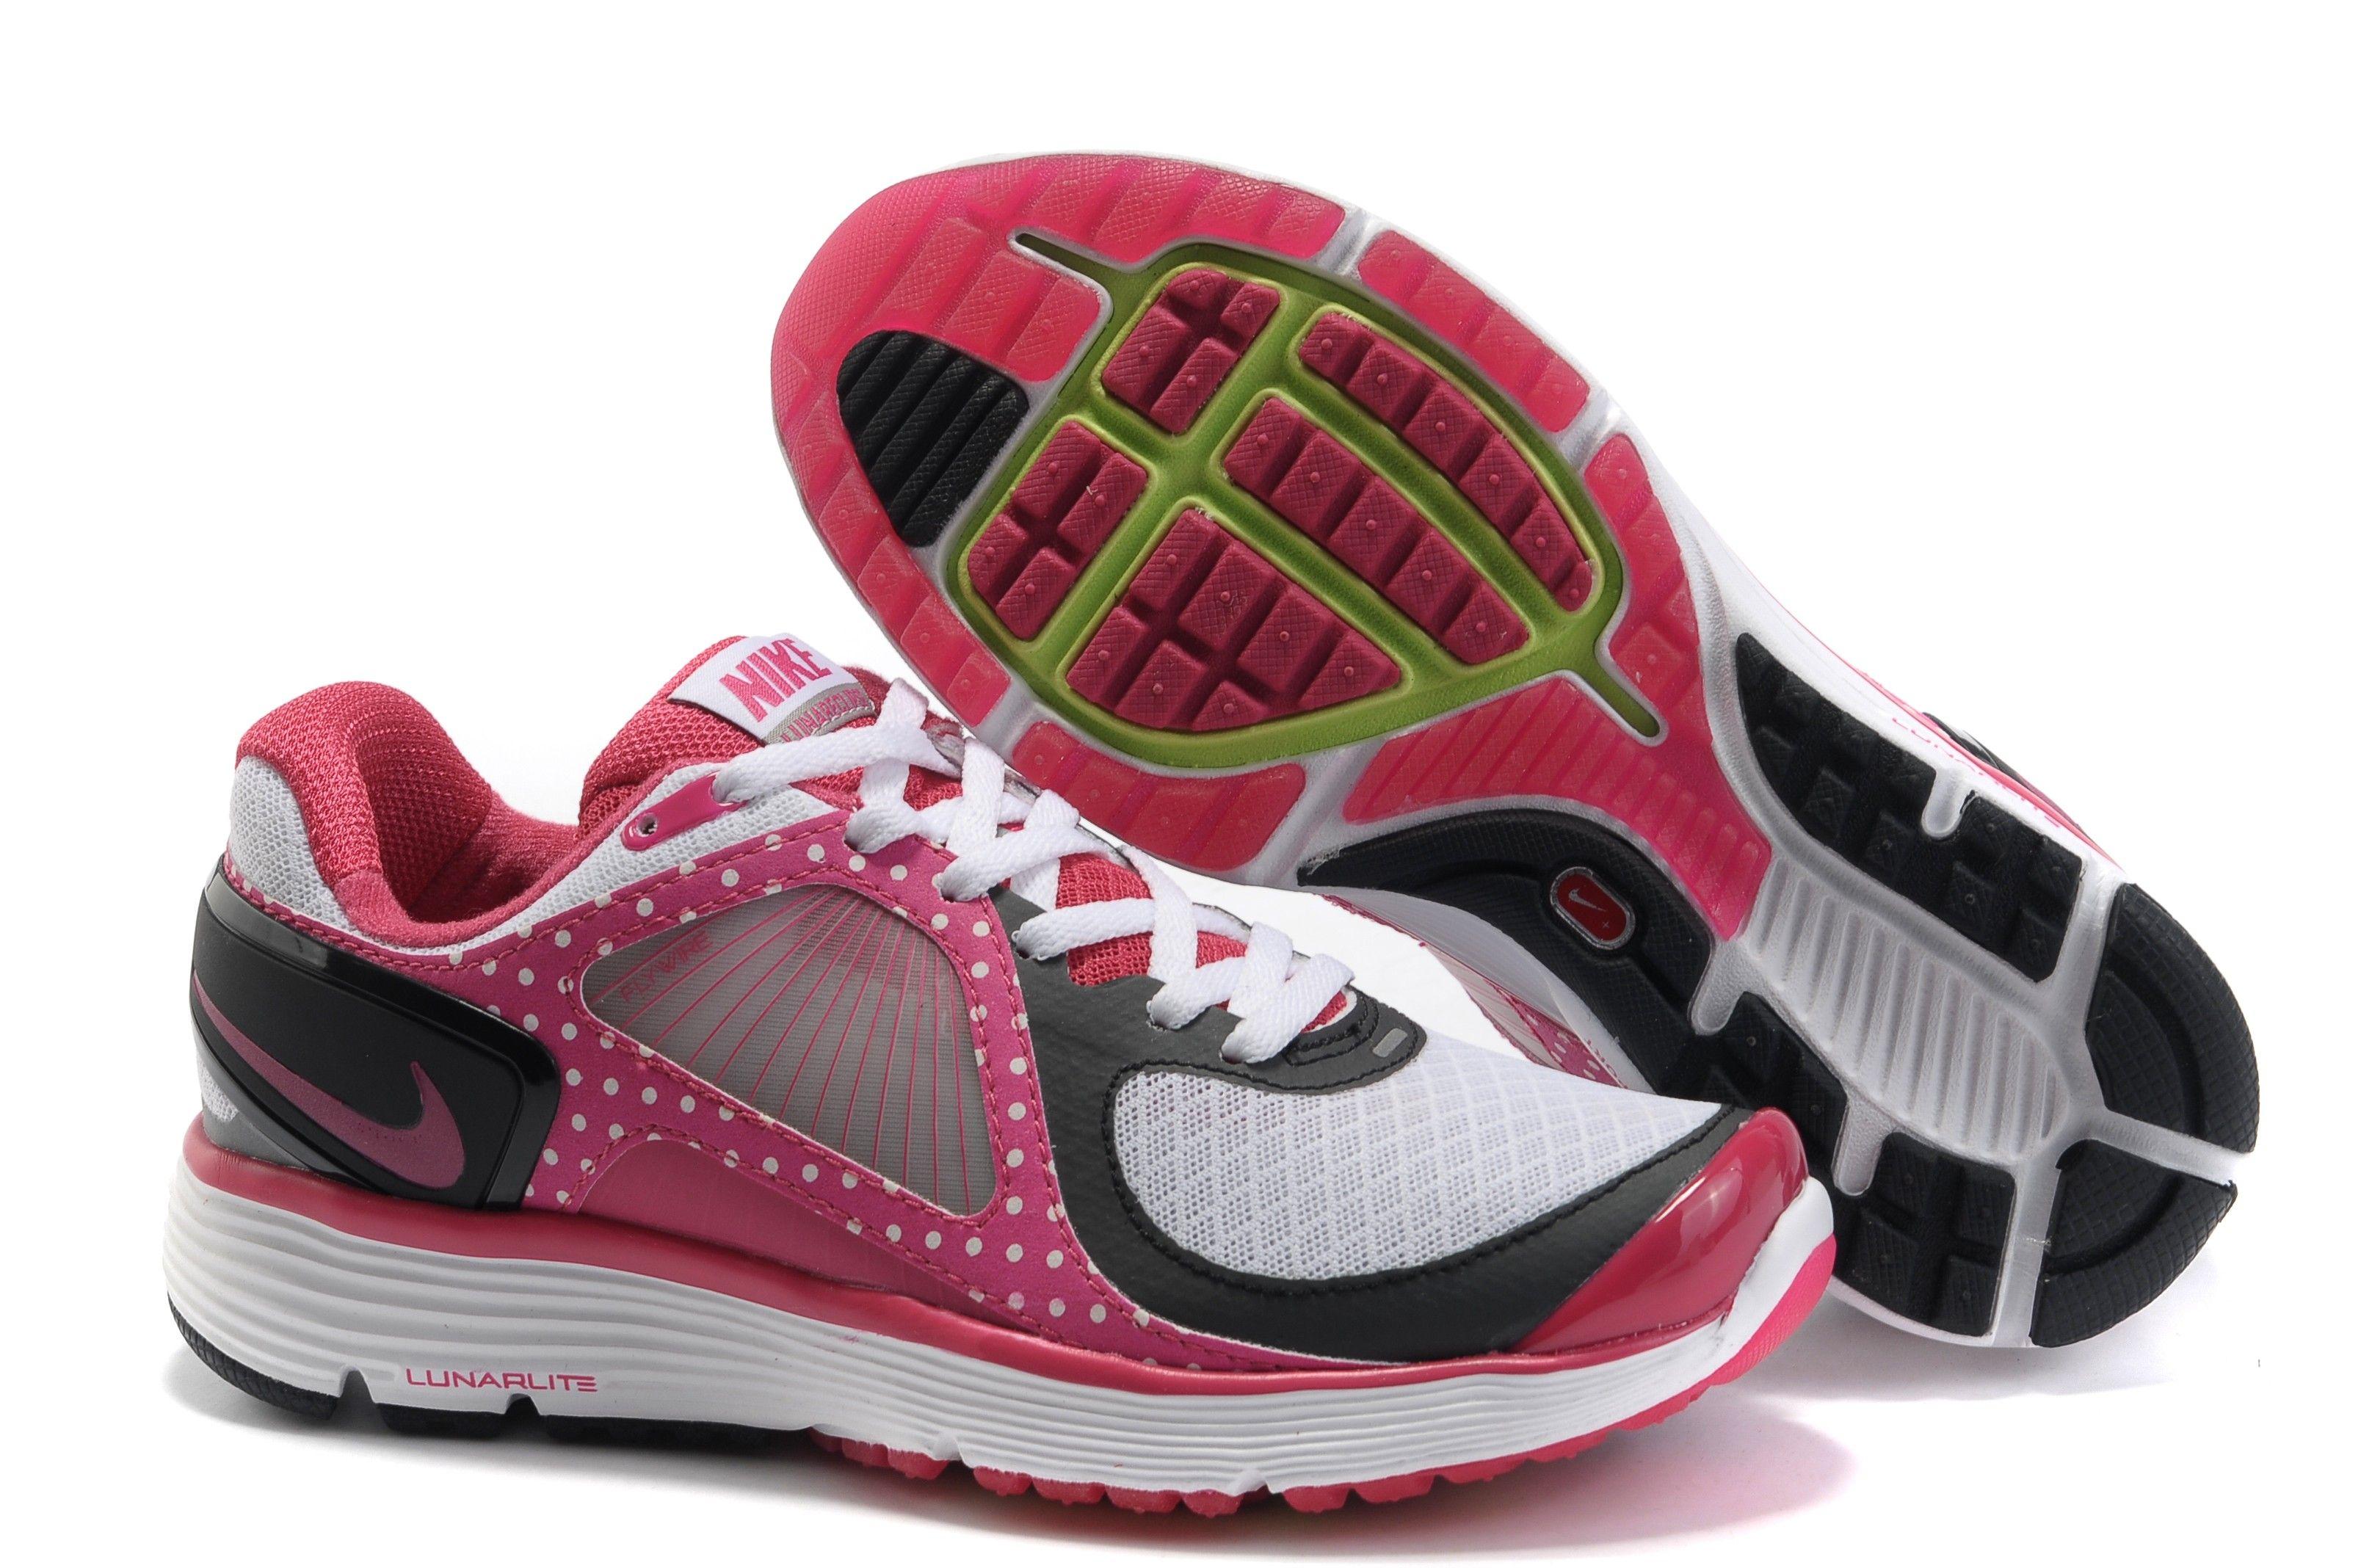 Nike Lunareclipse Women White And Pink  Nike Lunar Shoe